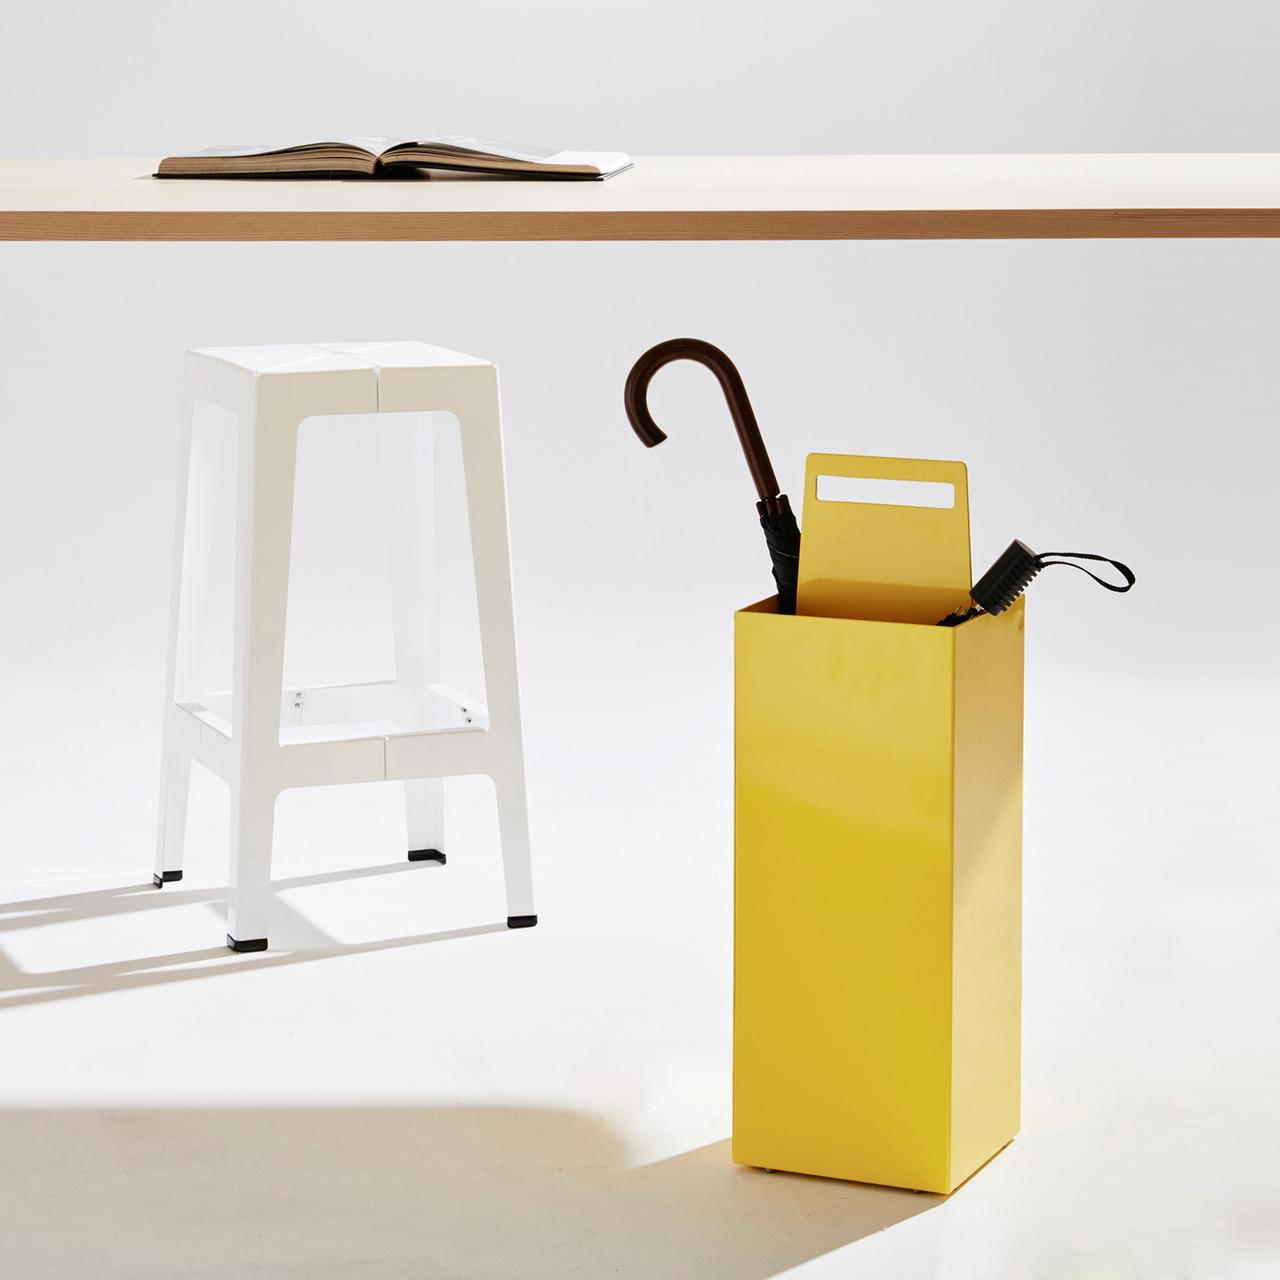 A Modern Umbrella Stand by Seaton Mckeon & DesignByThem